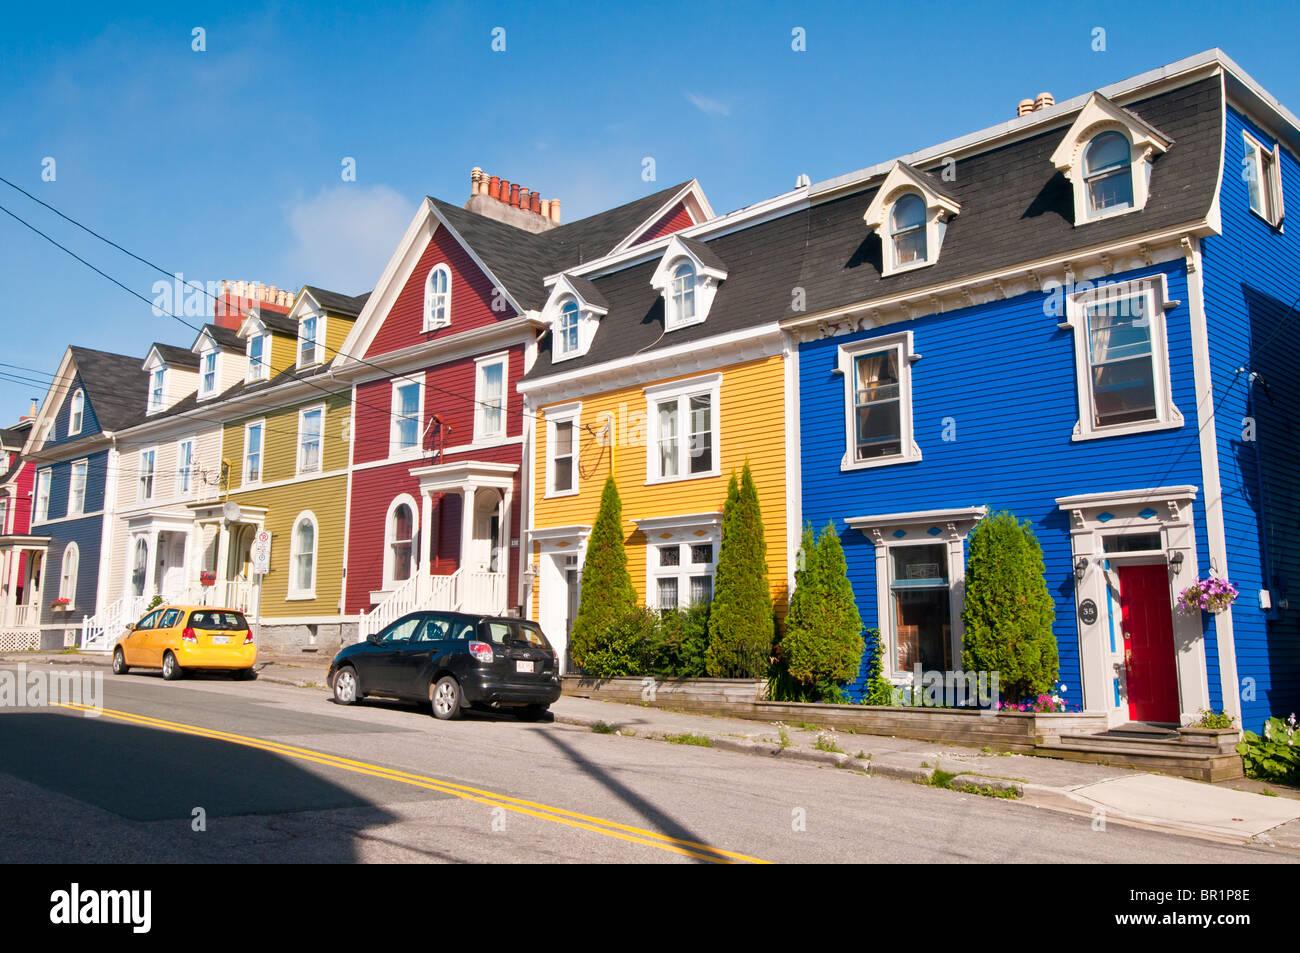 Jelly Bean Row >> Colorful Jelly Bean Row Houses Gower Street St John S Stock Photo